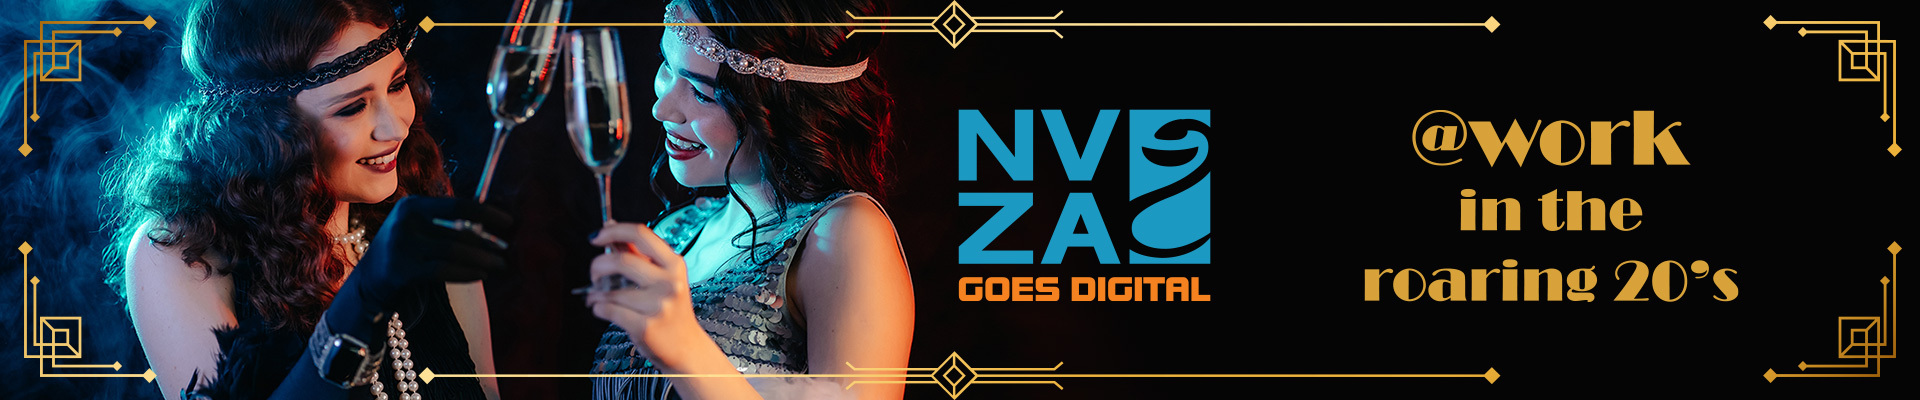 NVZA goes digital: @WORK in de Roaring 20's